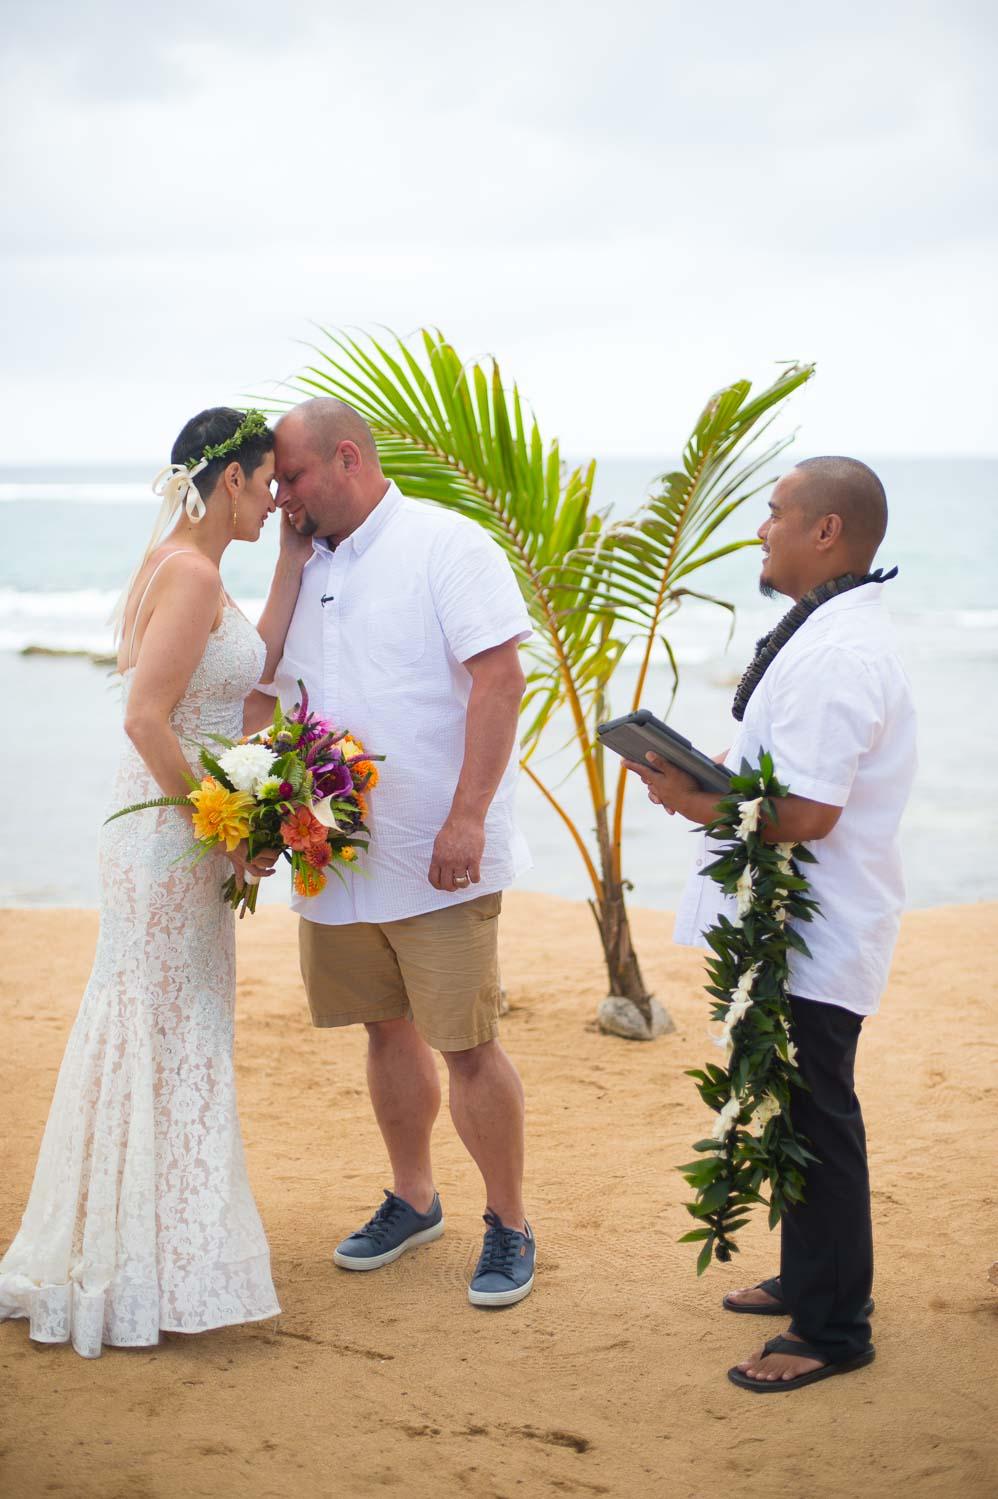 maui-wedding-photography-maui-wedding-venue-Tad-Craig-Photography-11.jpg